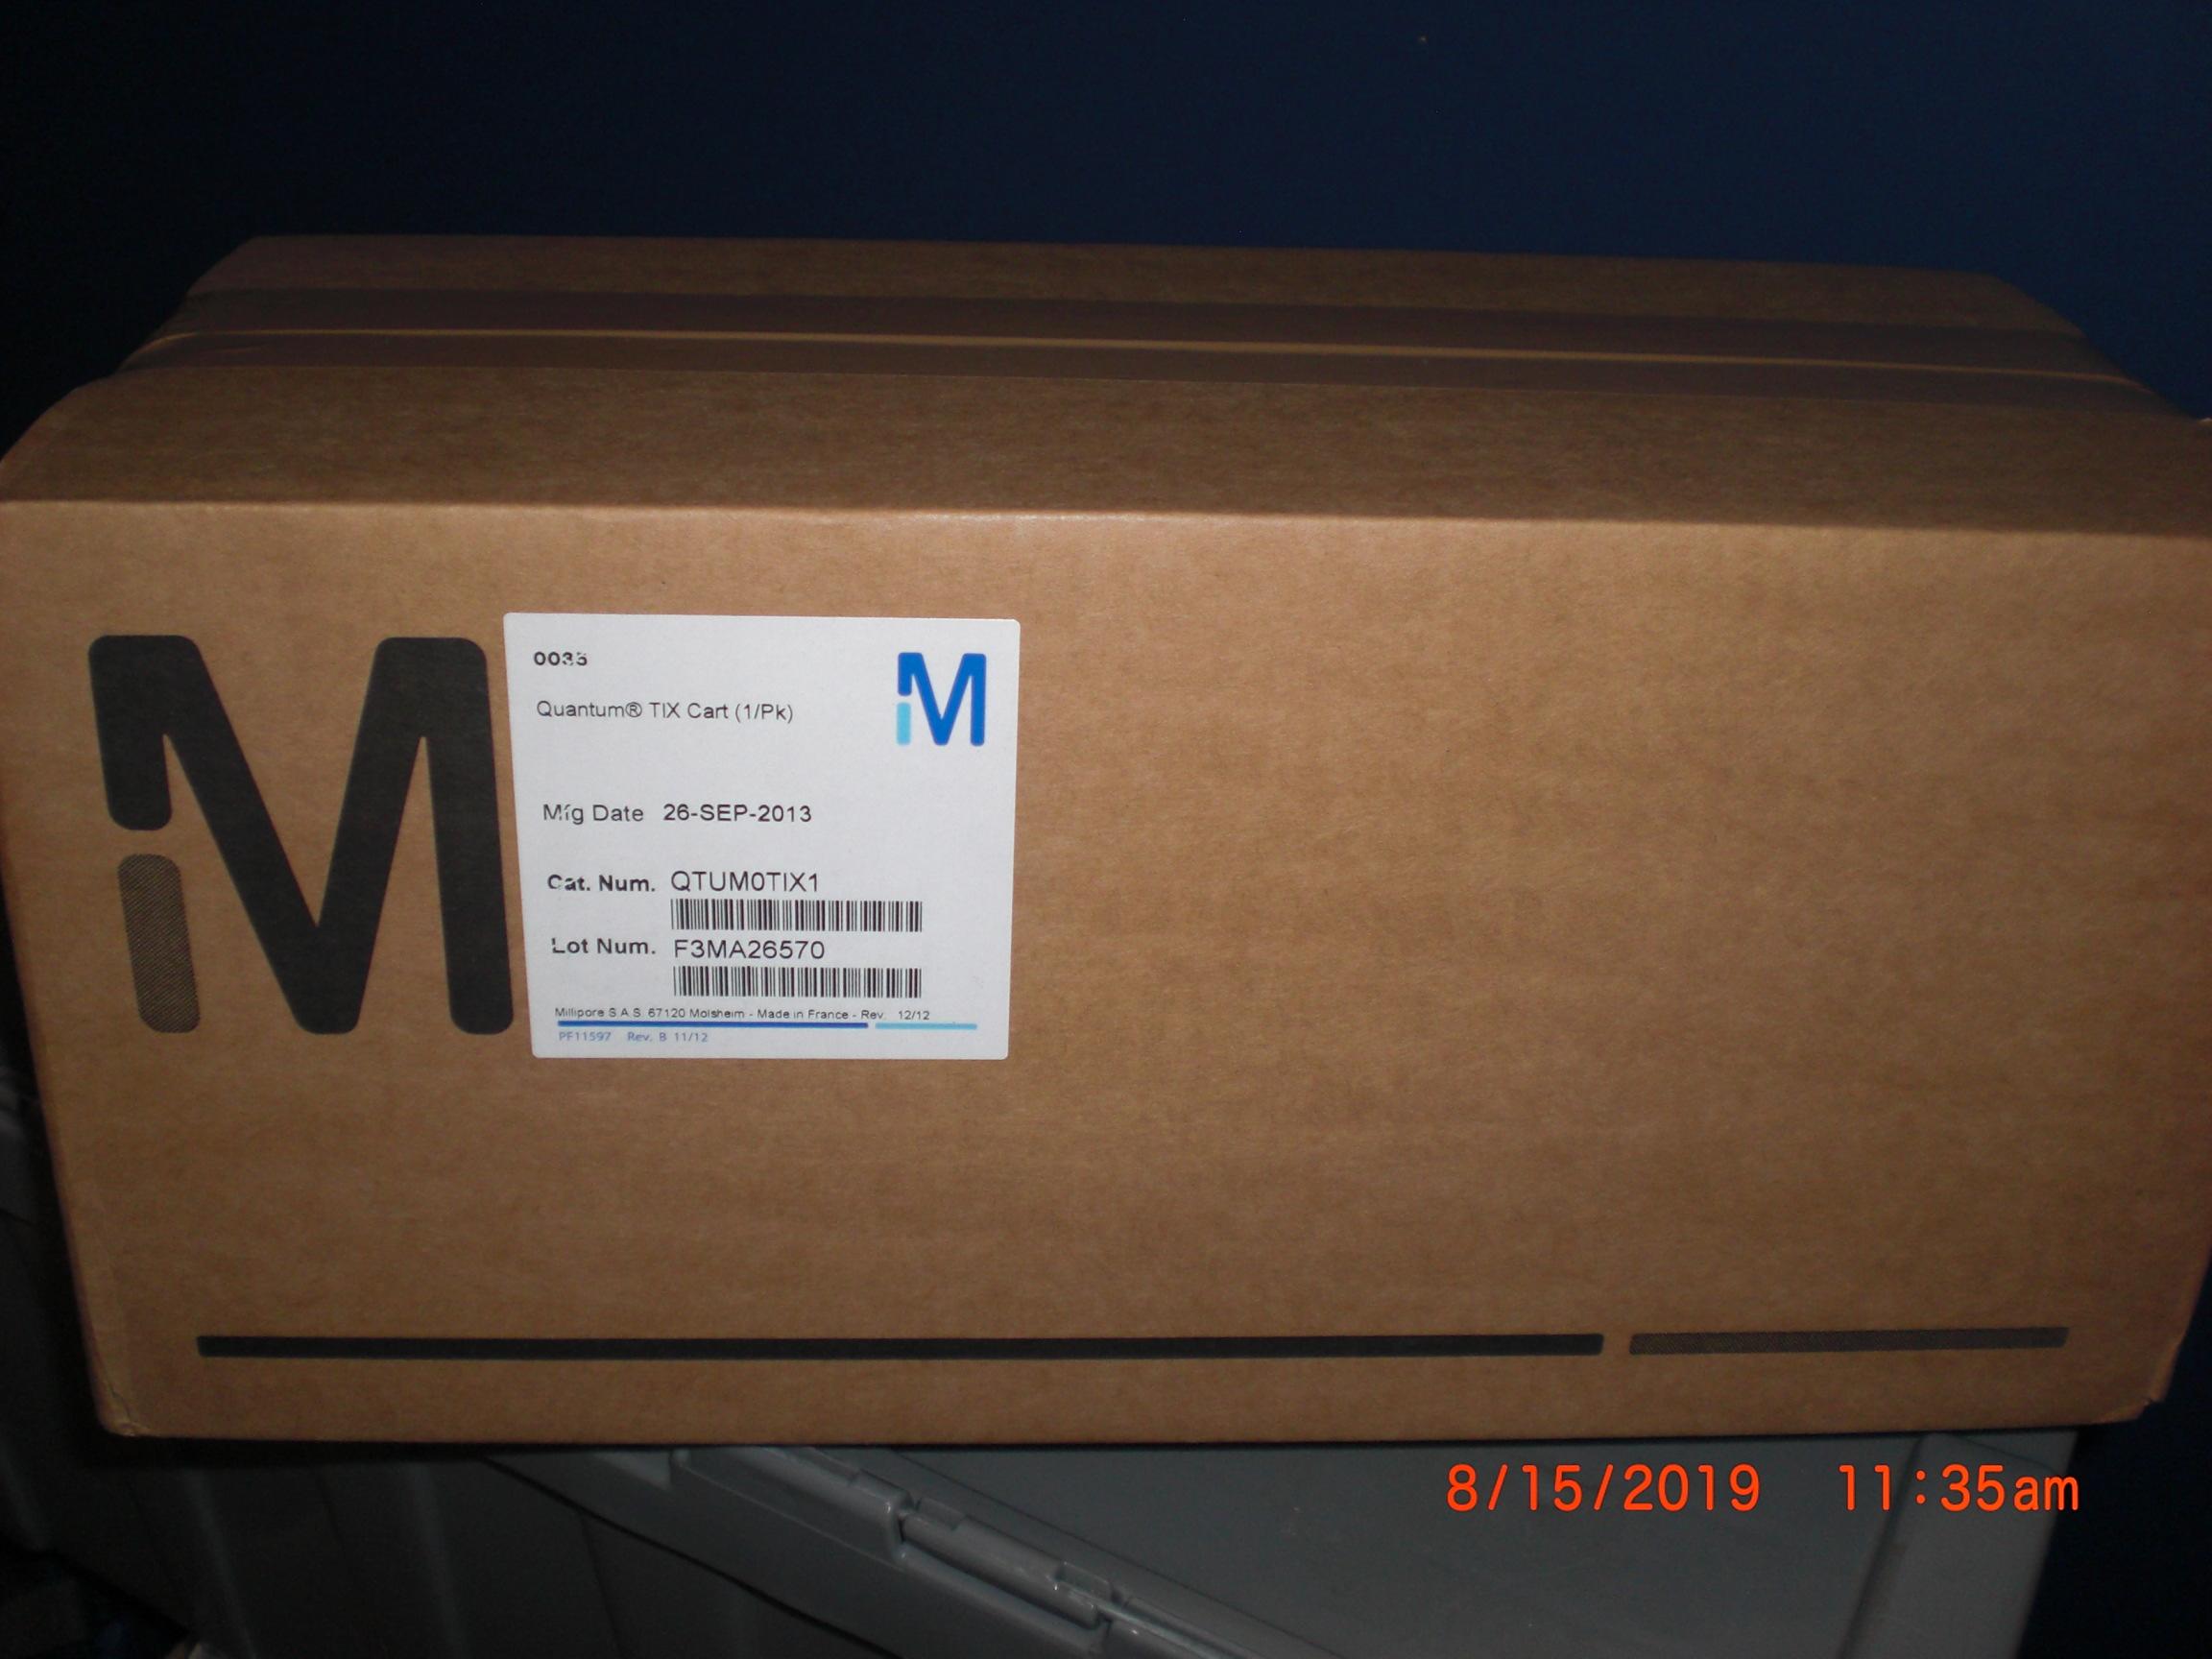 Filter  MILLIPORE Mykrolis QTUM0T1X1 Quantum T1X Cart (1/PK)